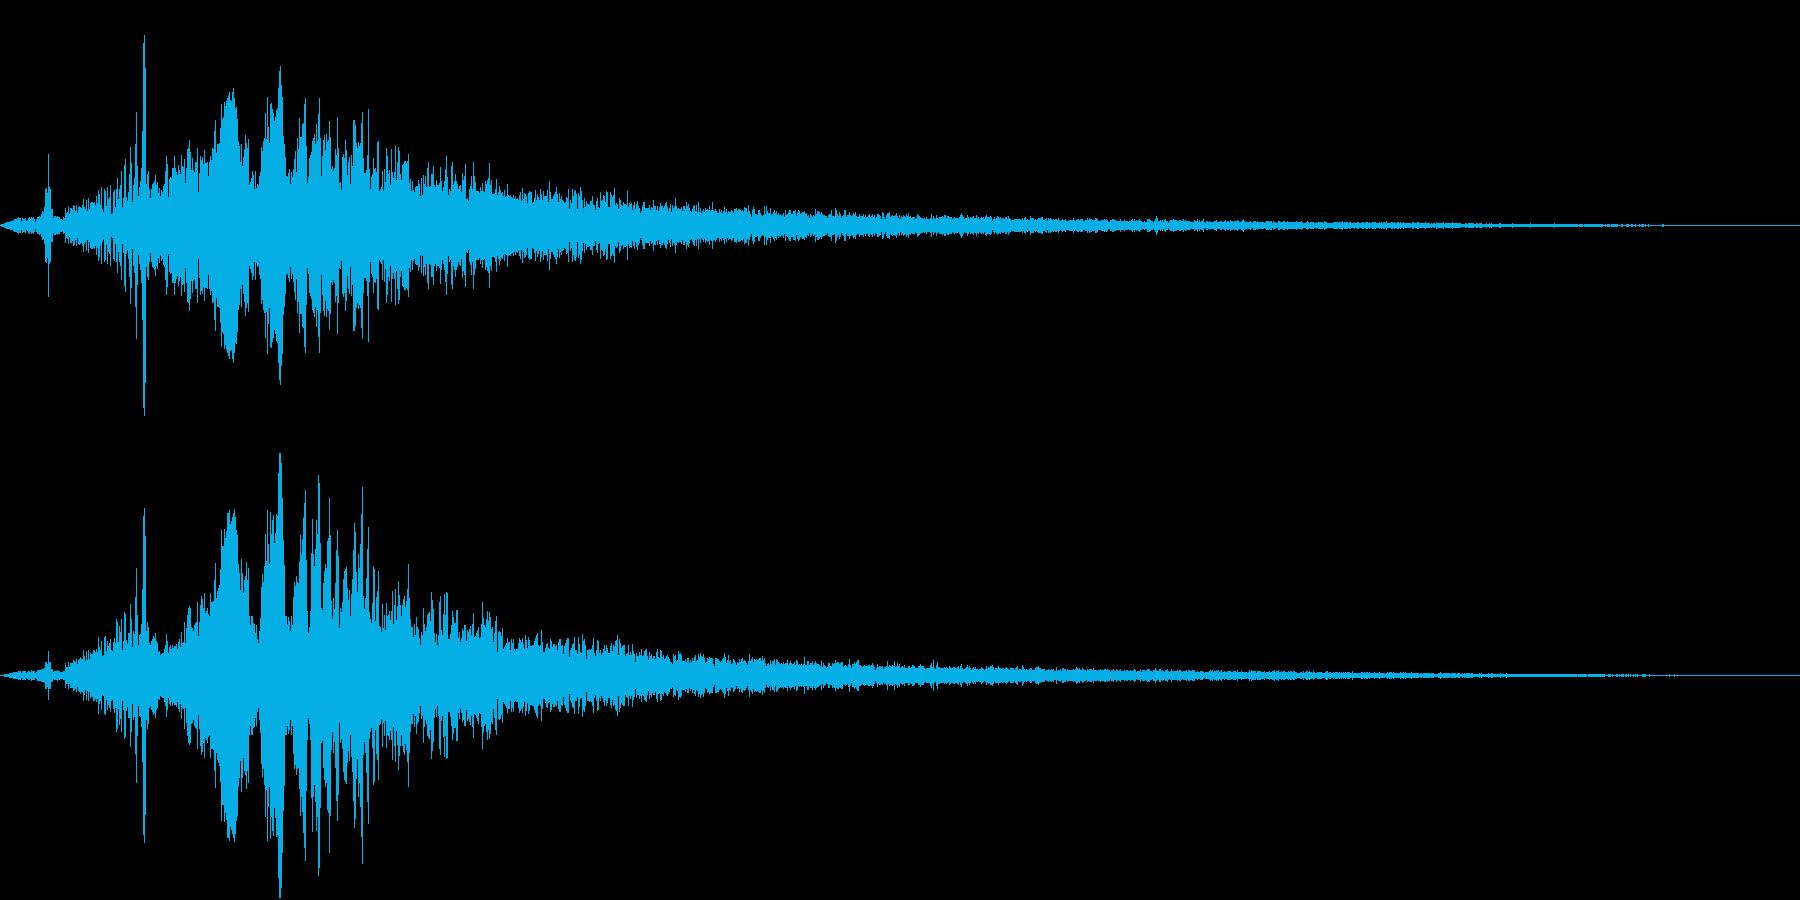 TV RADIO SFX4 チャプターの再生済みの波形